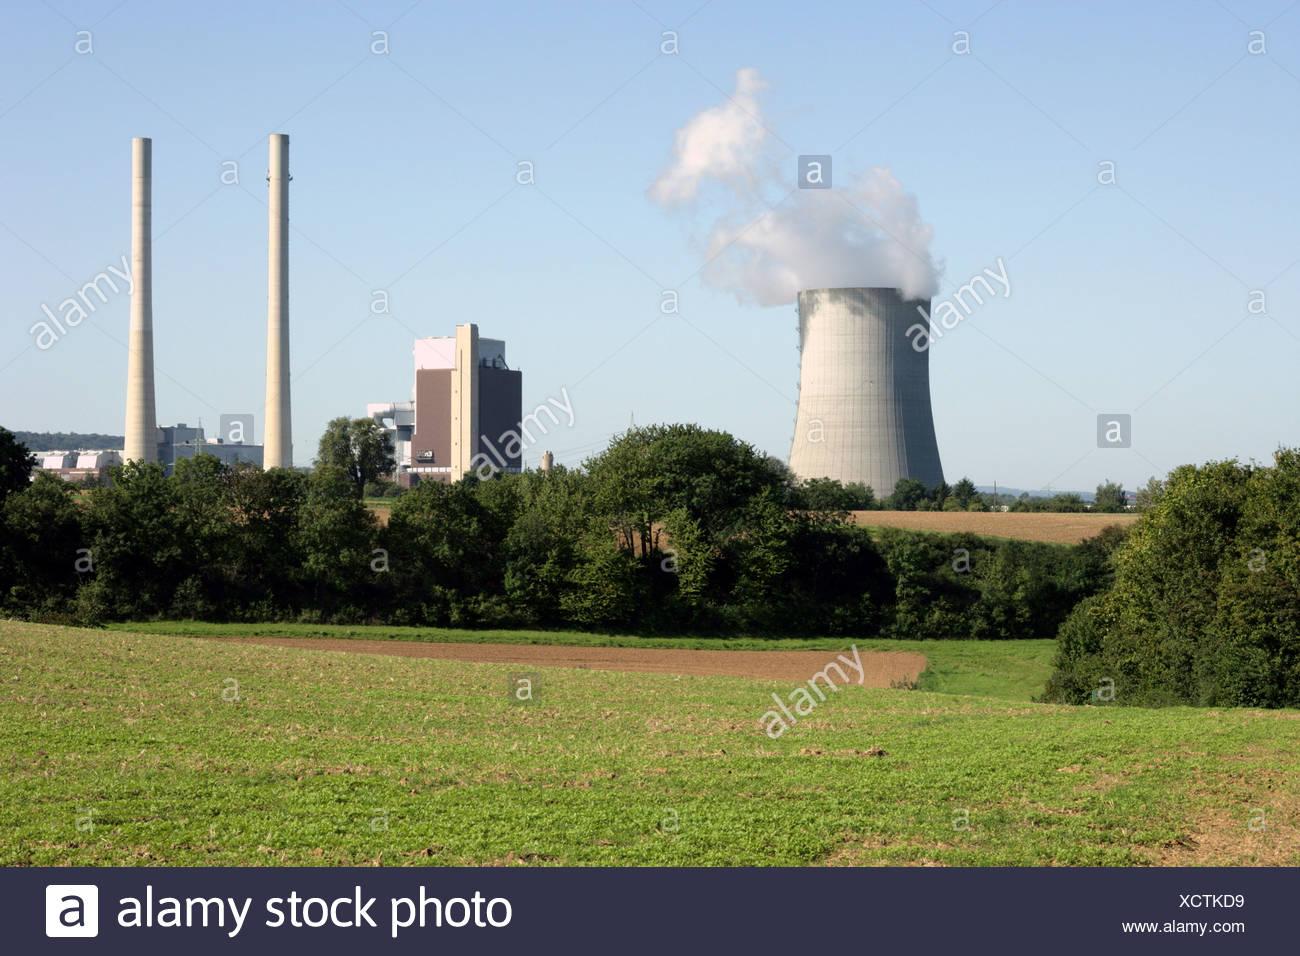 Germany Baden-Württemberg Heilbronn steam power-work chimneys smoke Europe economy industry energy Heizkraftwerk coal-fired Stock Photo